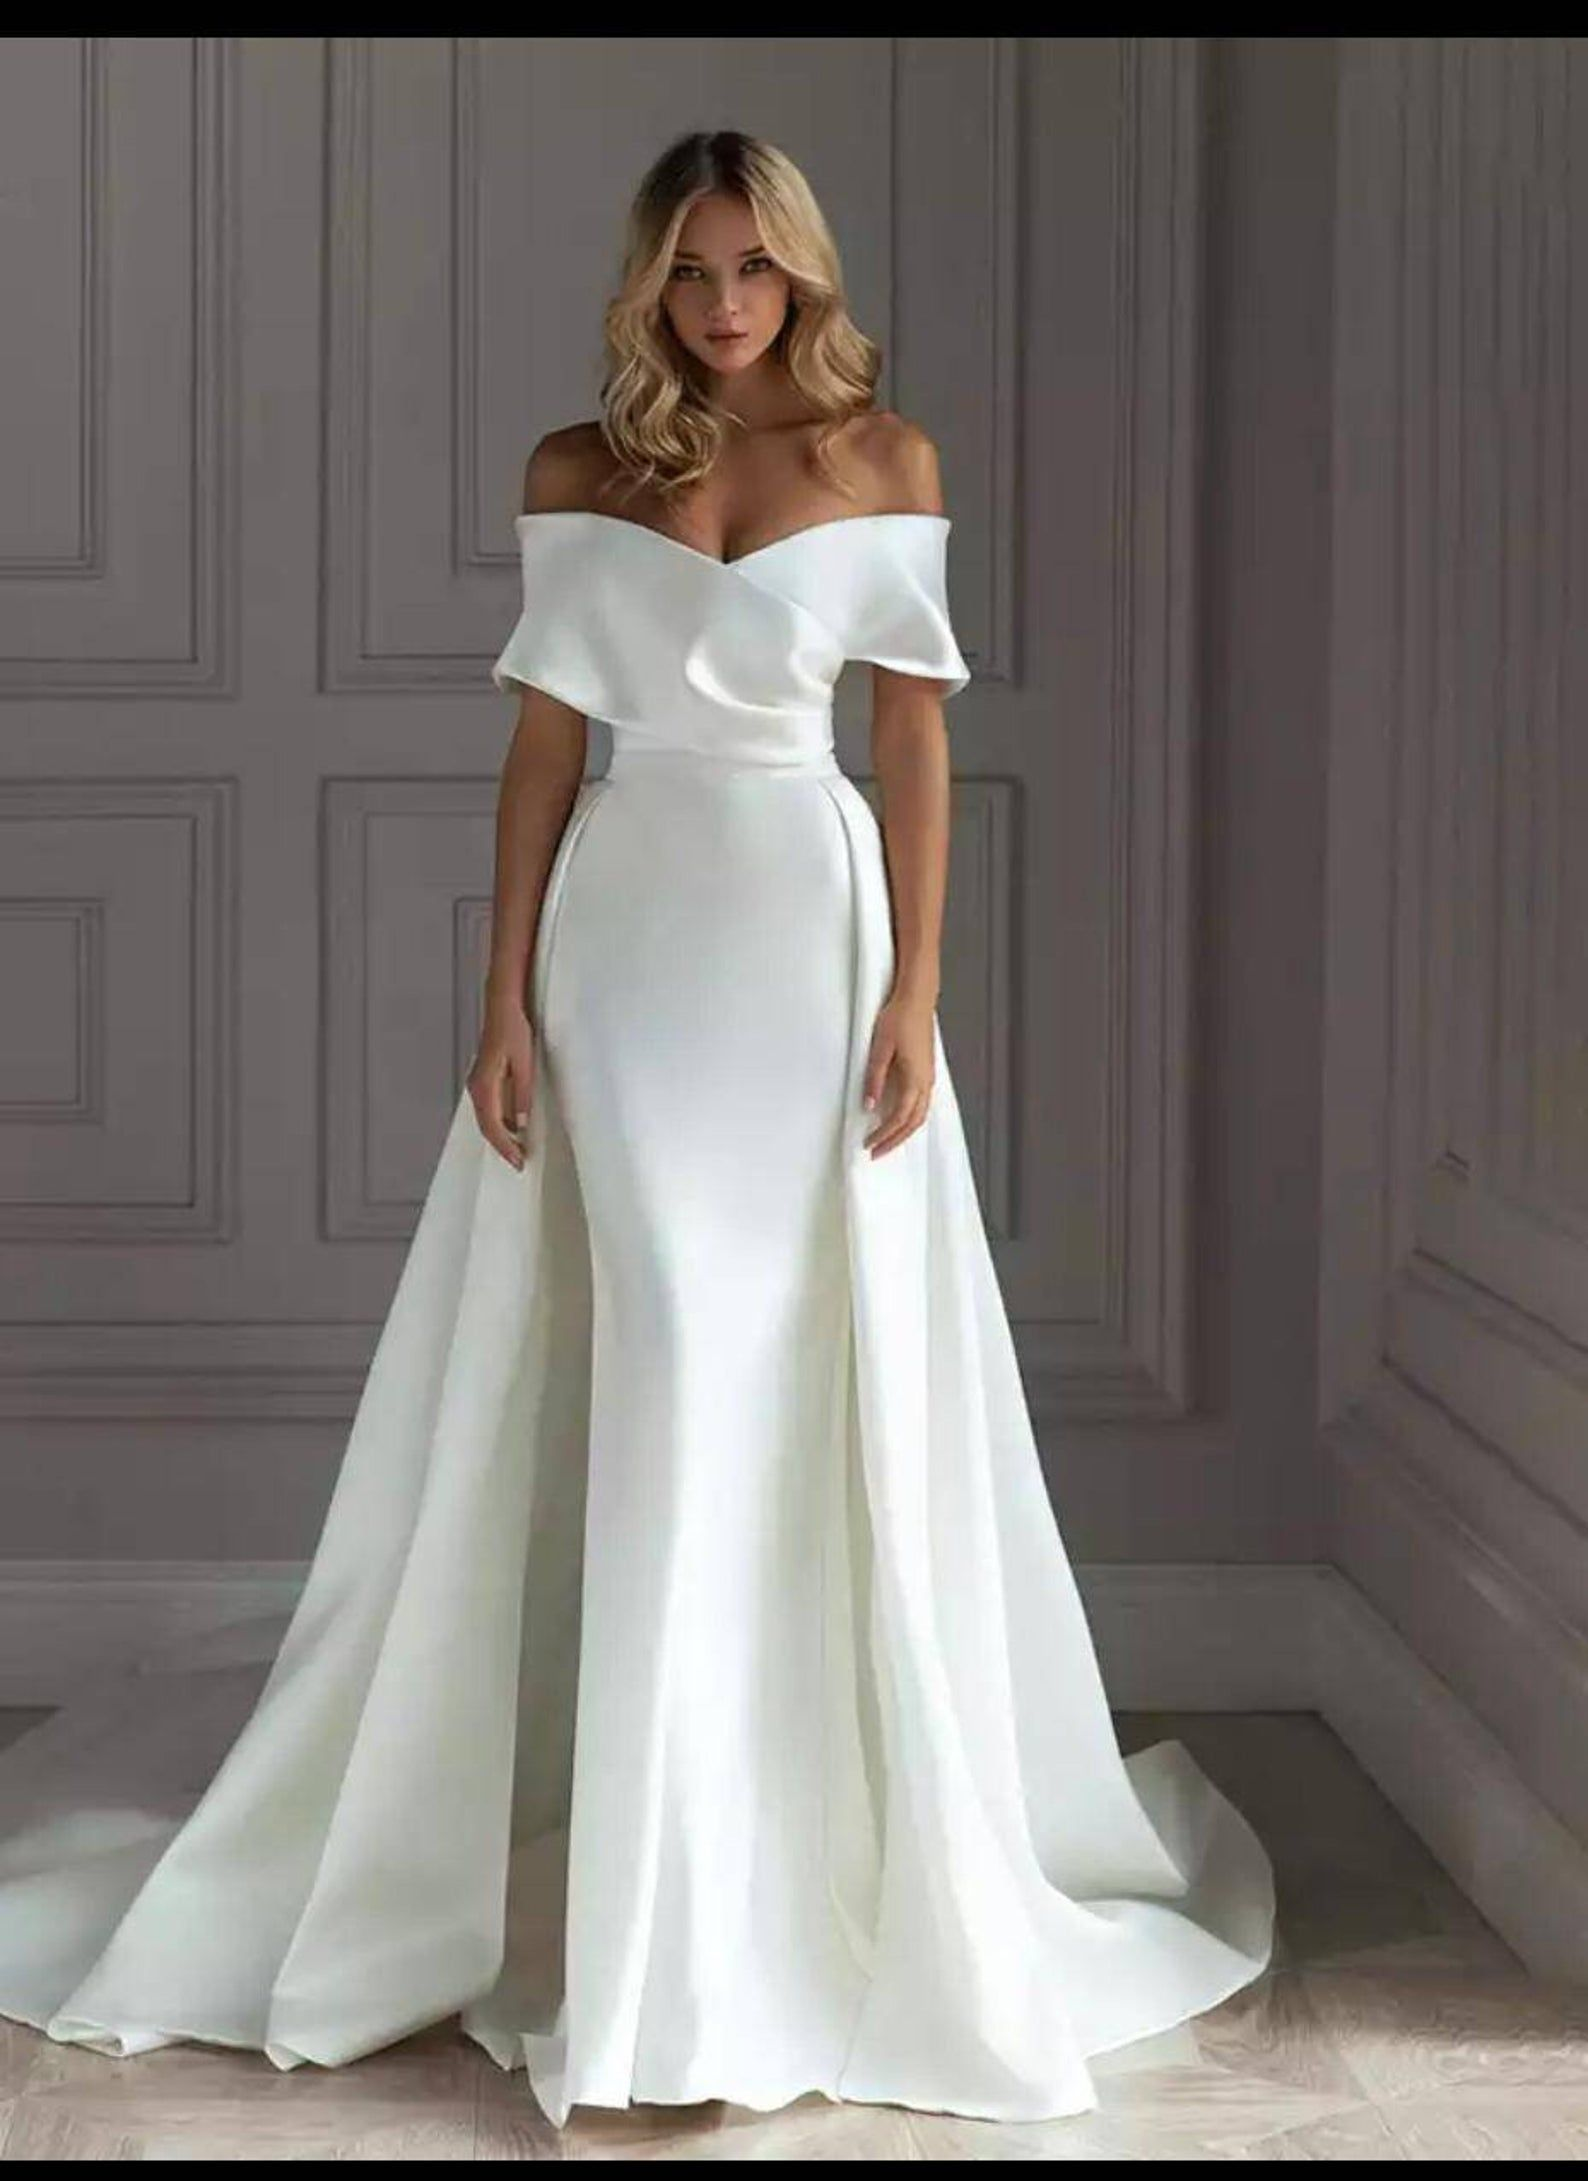 Mermaid Wedding Dress Wedding Dress Reception Dress Wedding Etsy In 2021 Glamourous Wedding Dress Wedding Dress Guide Bridal Dresses [ 2181 x 1588 Pixel ]